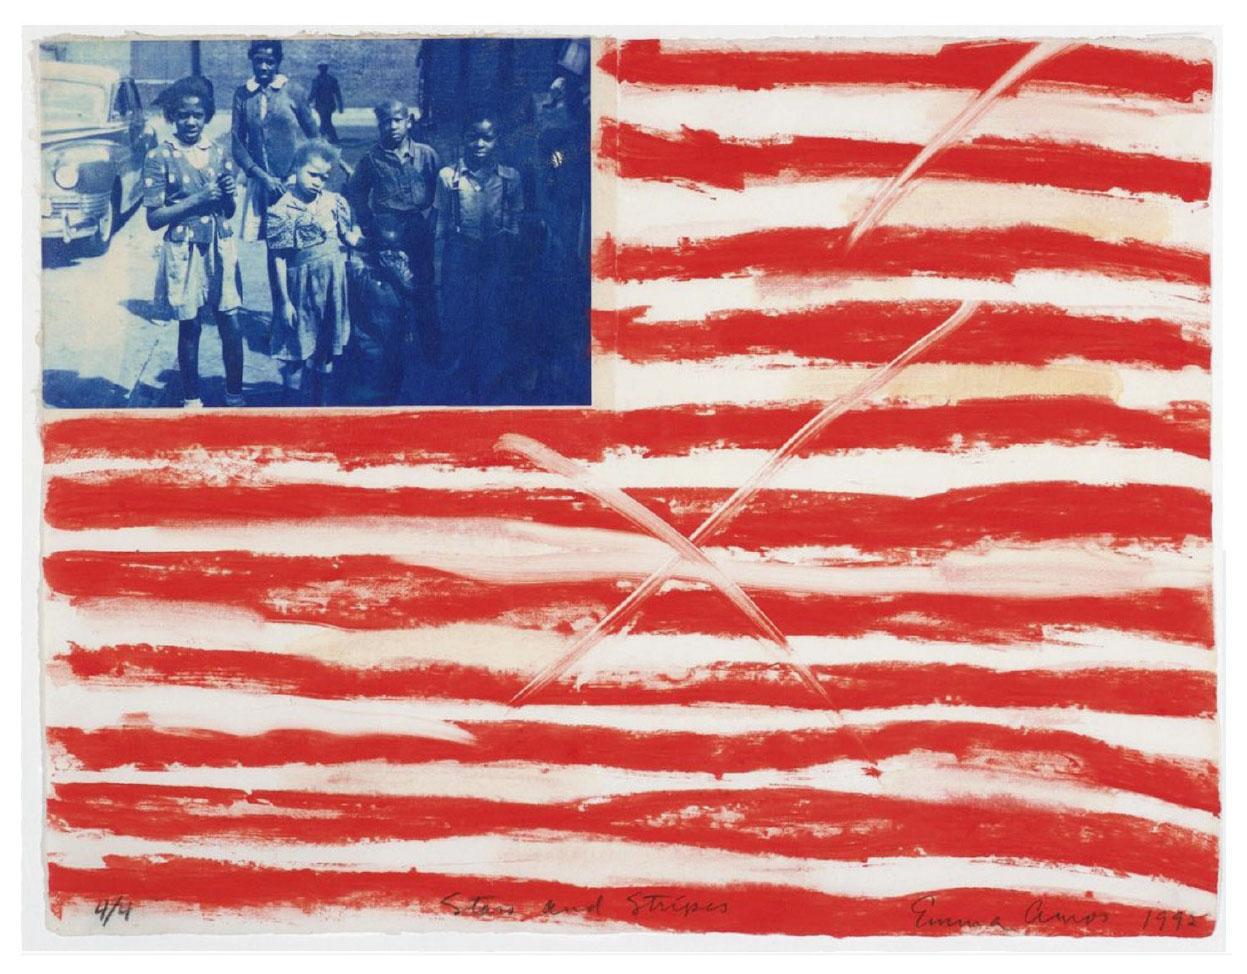 Amos Stars and Stripes artwork